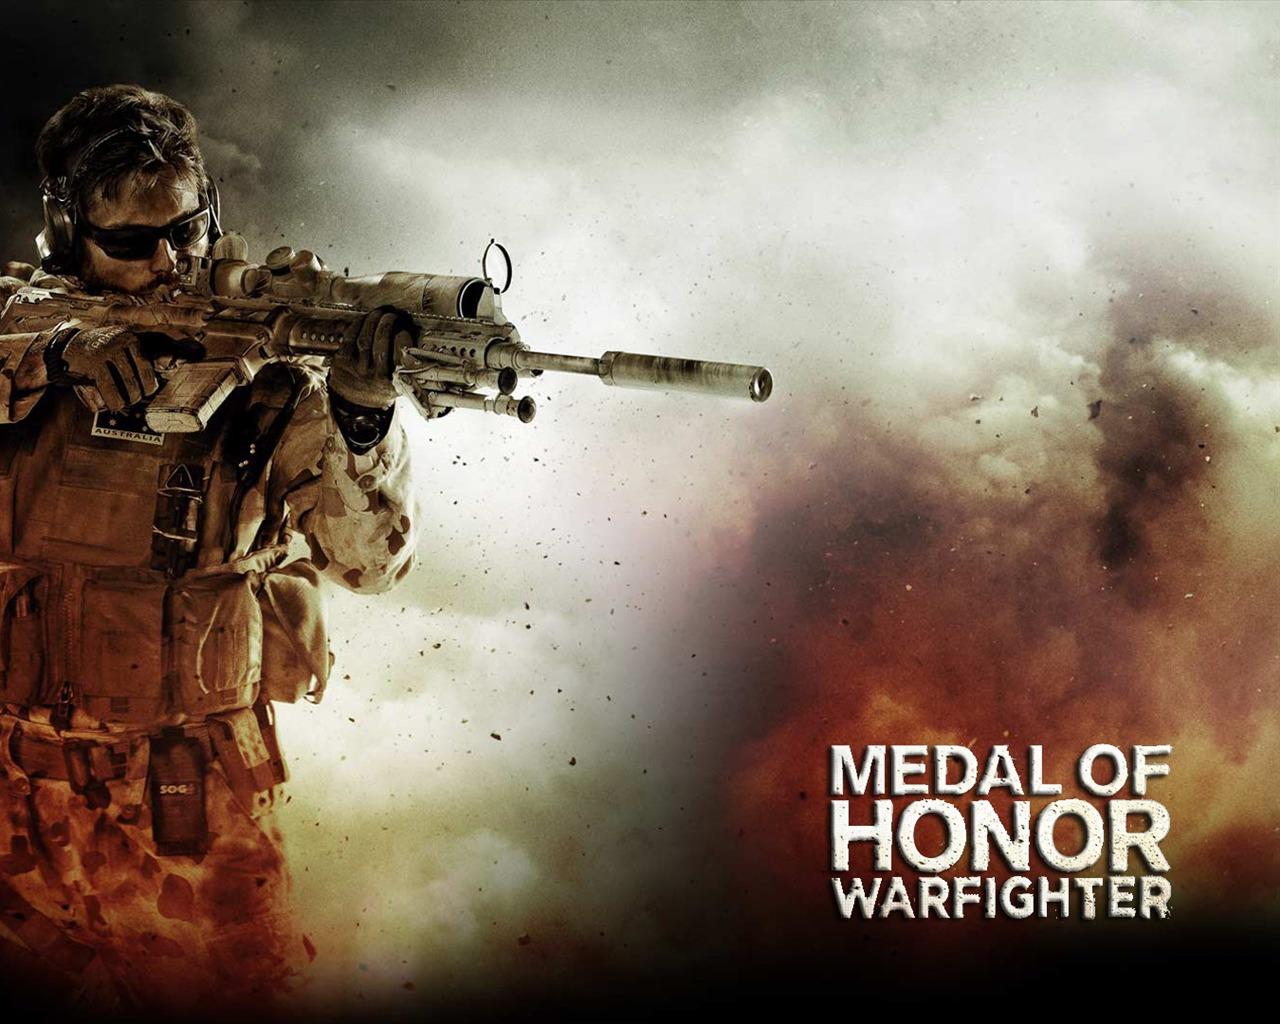 moh warfighter wallpaper hd - photo #24